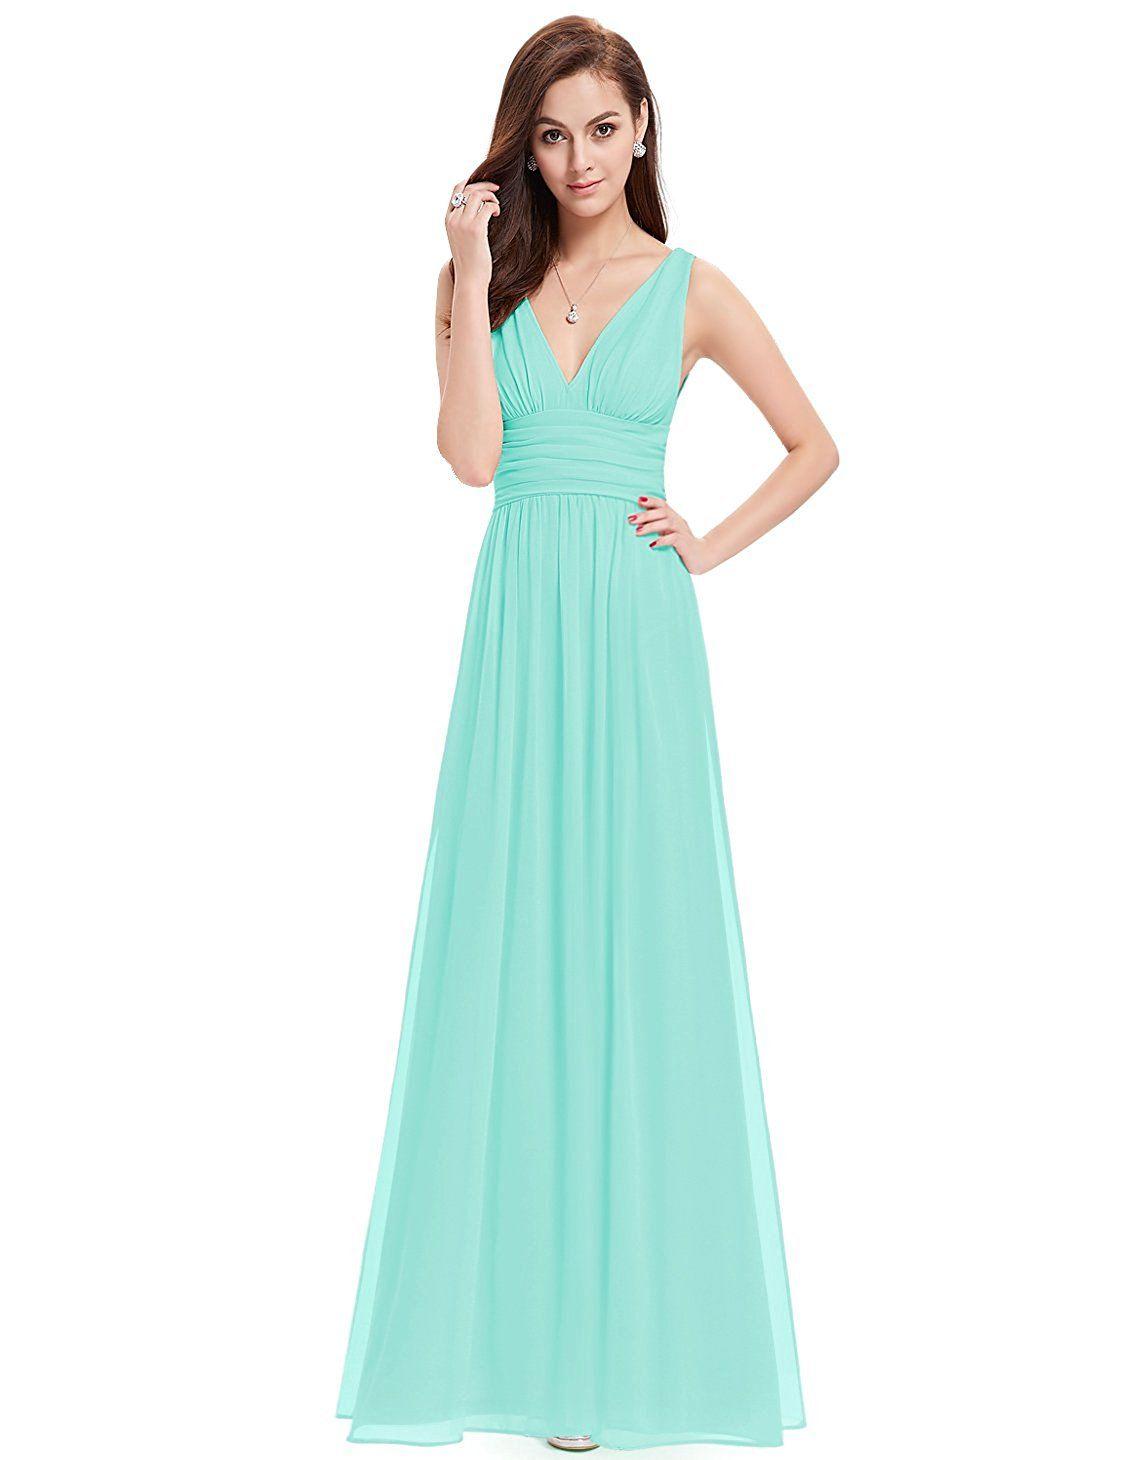 Magnificent Maxi Dresses Party Photos - Wedding Ideas - memiocall.com